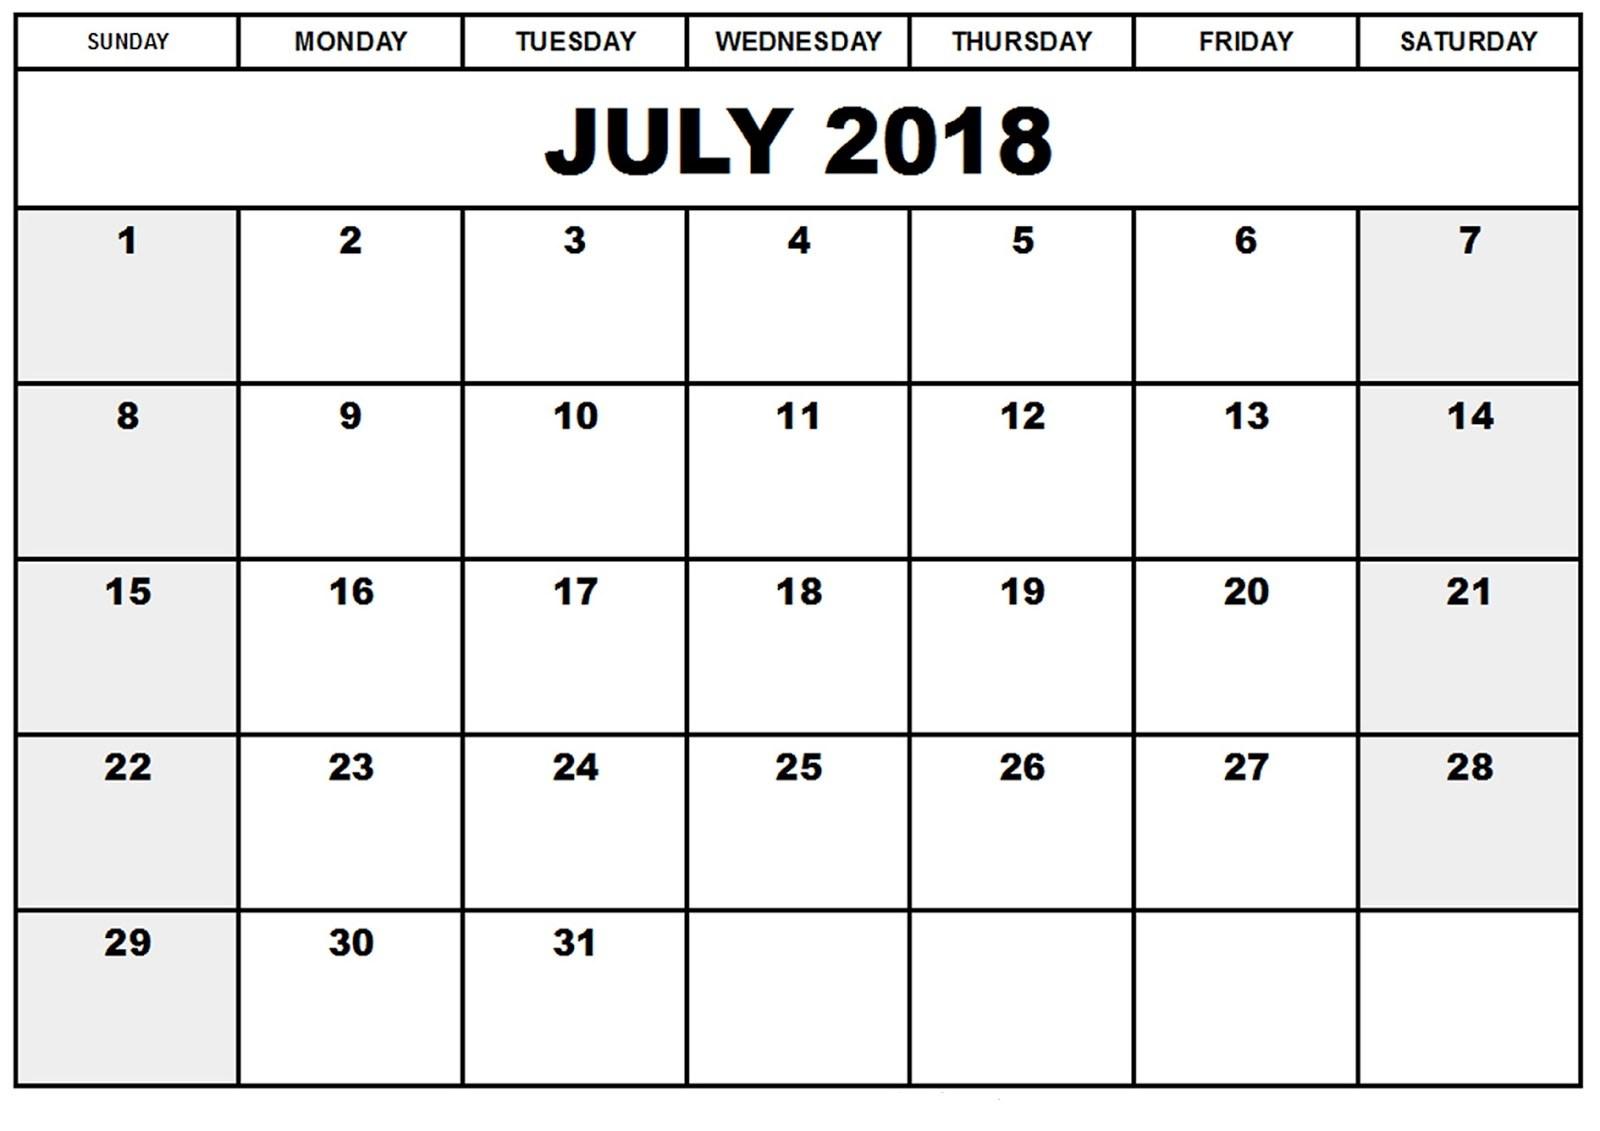 Free Printable Calendar July 2018